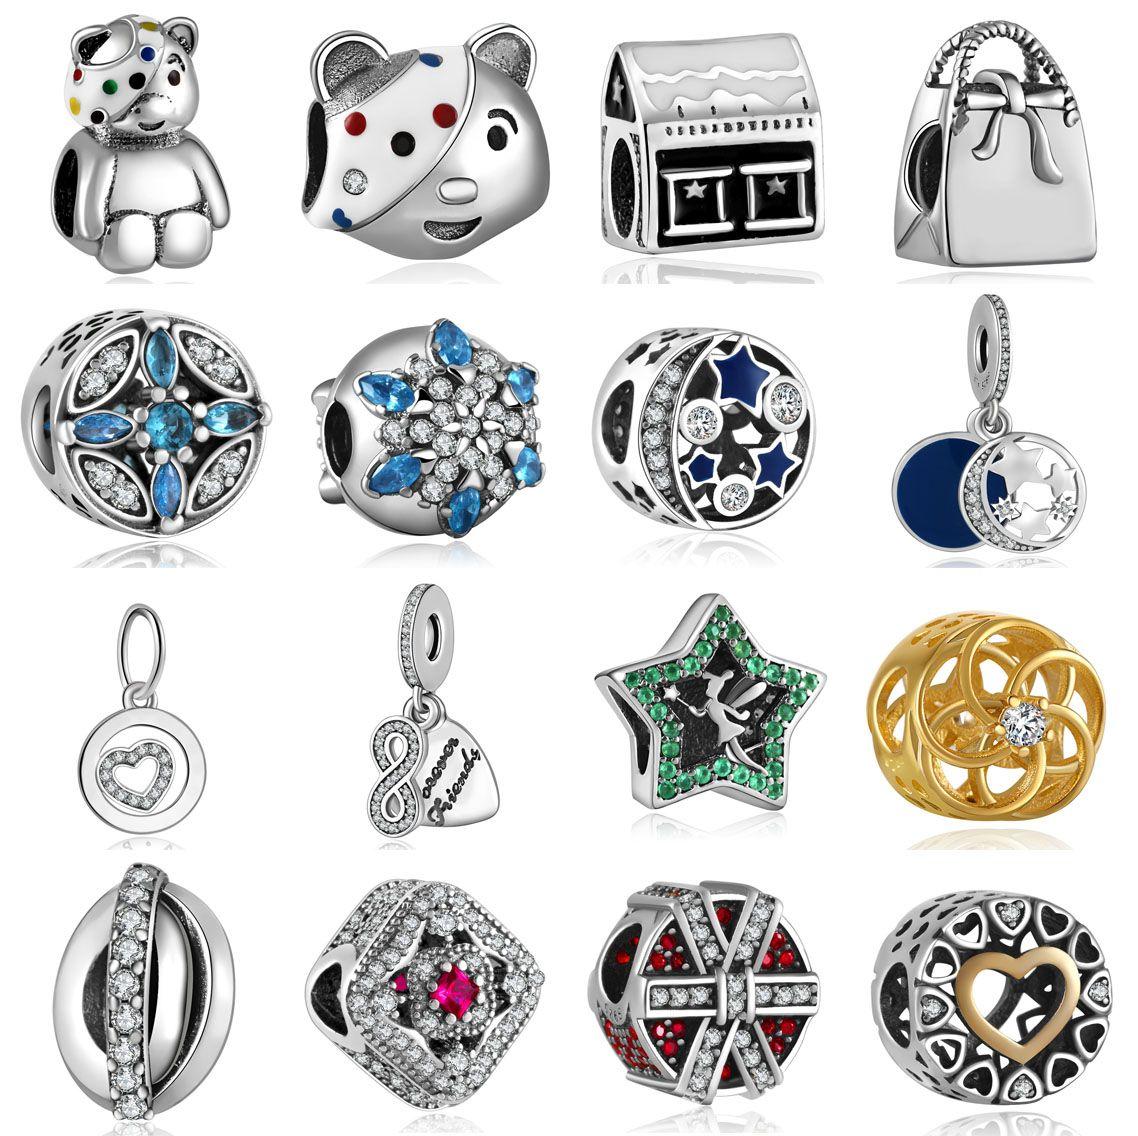 European Silver CZ Charm Beads Fit sterling 925 Necklace Bracelet Chain